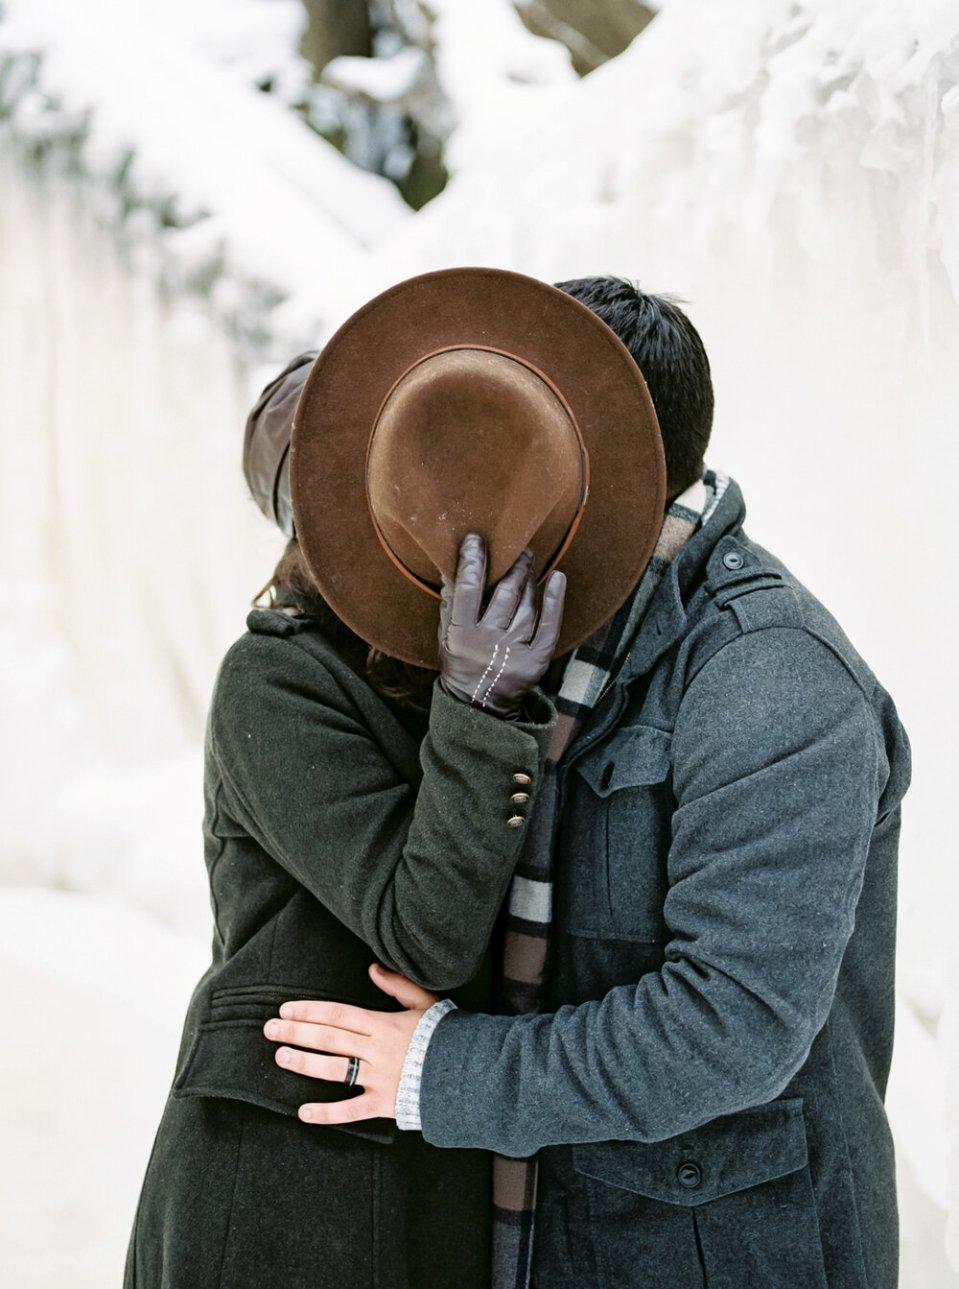 3 Frozen+Brandywine+Falls+Photos+by+Cleveland+Wedding+Photographer+Matt+Erickson+Photography.jpg